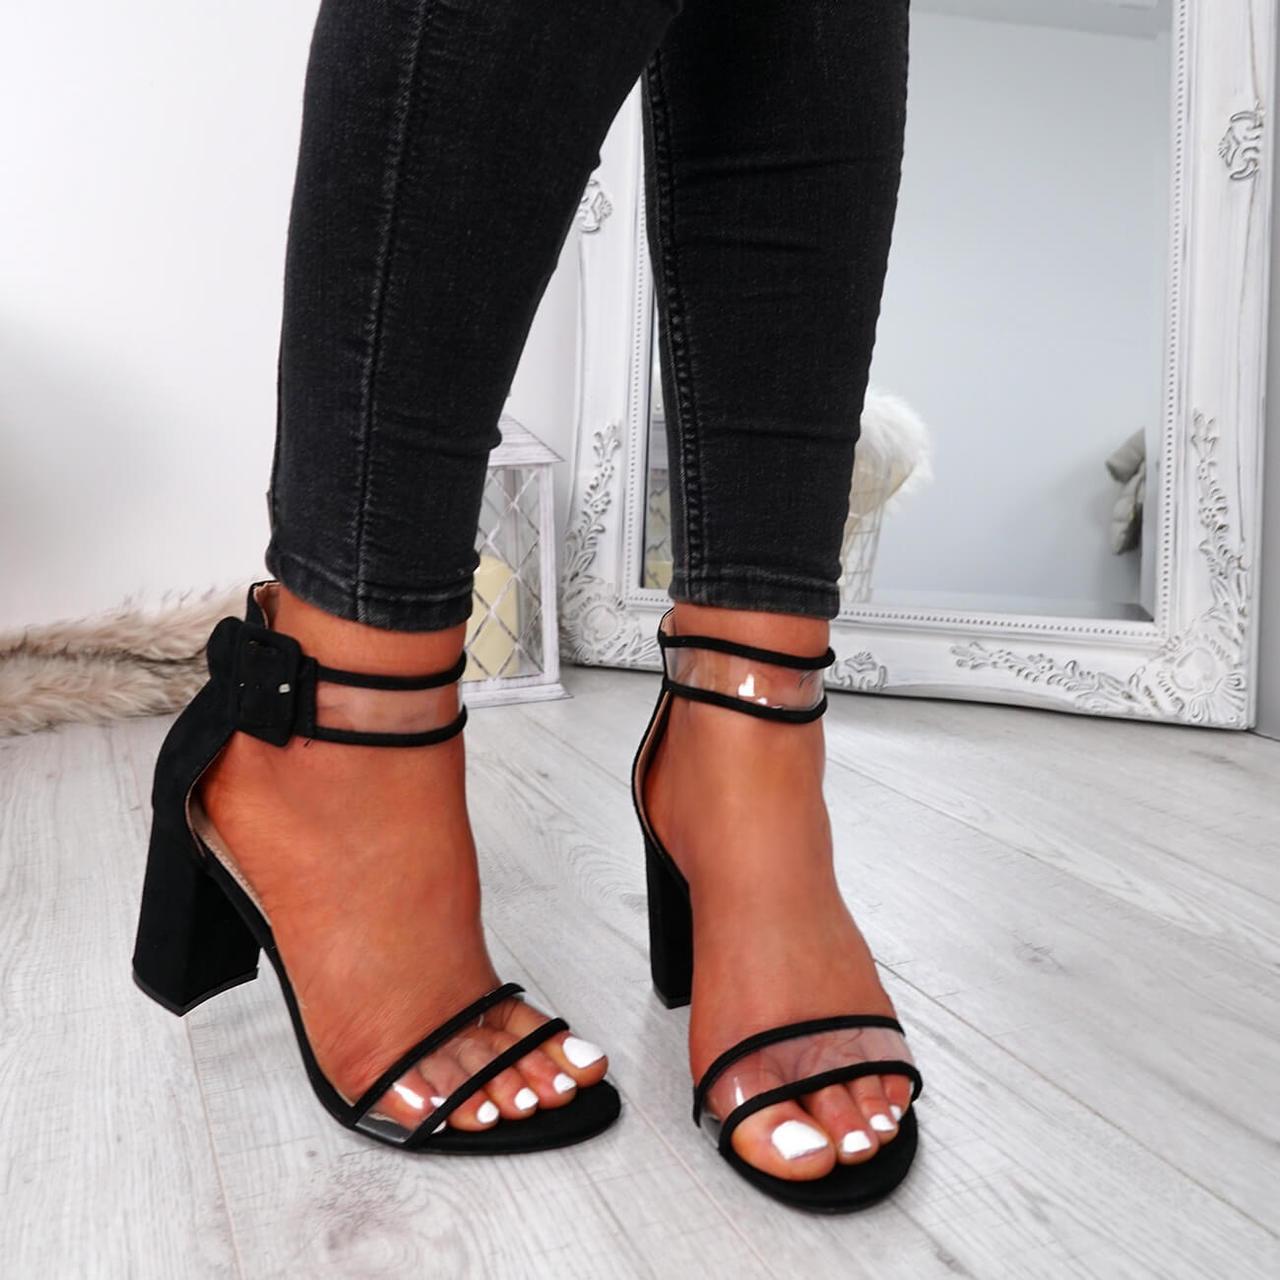 eb89fd55ef3 Womens Ladies Ankle Strap Peep Toe High Block Heel Sandals Fashion Shoes